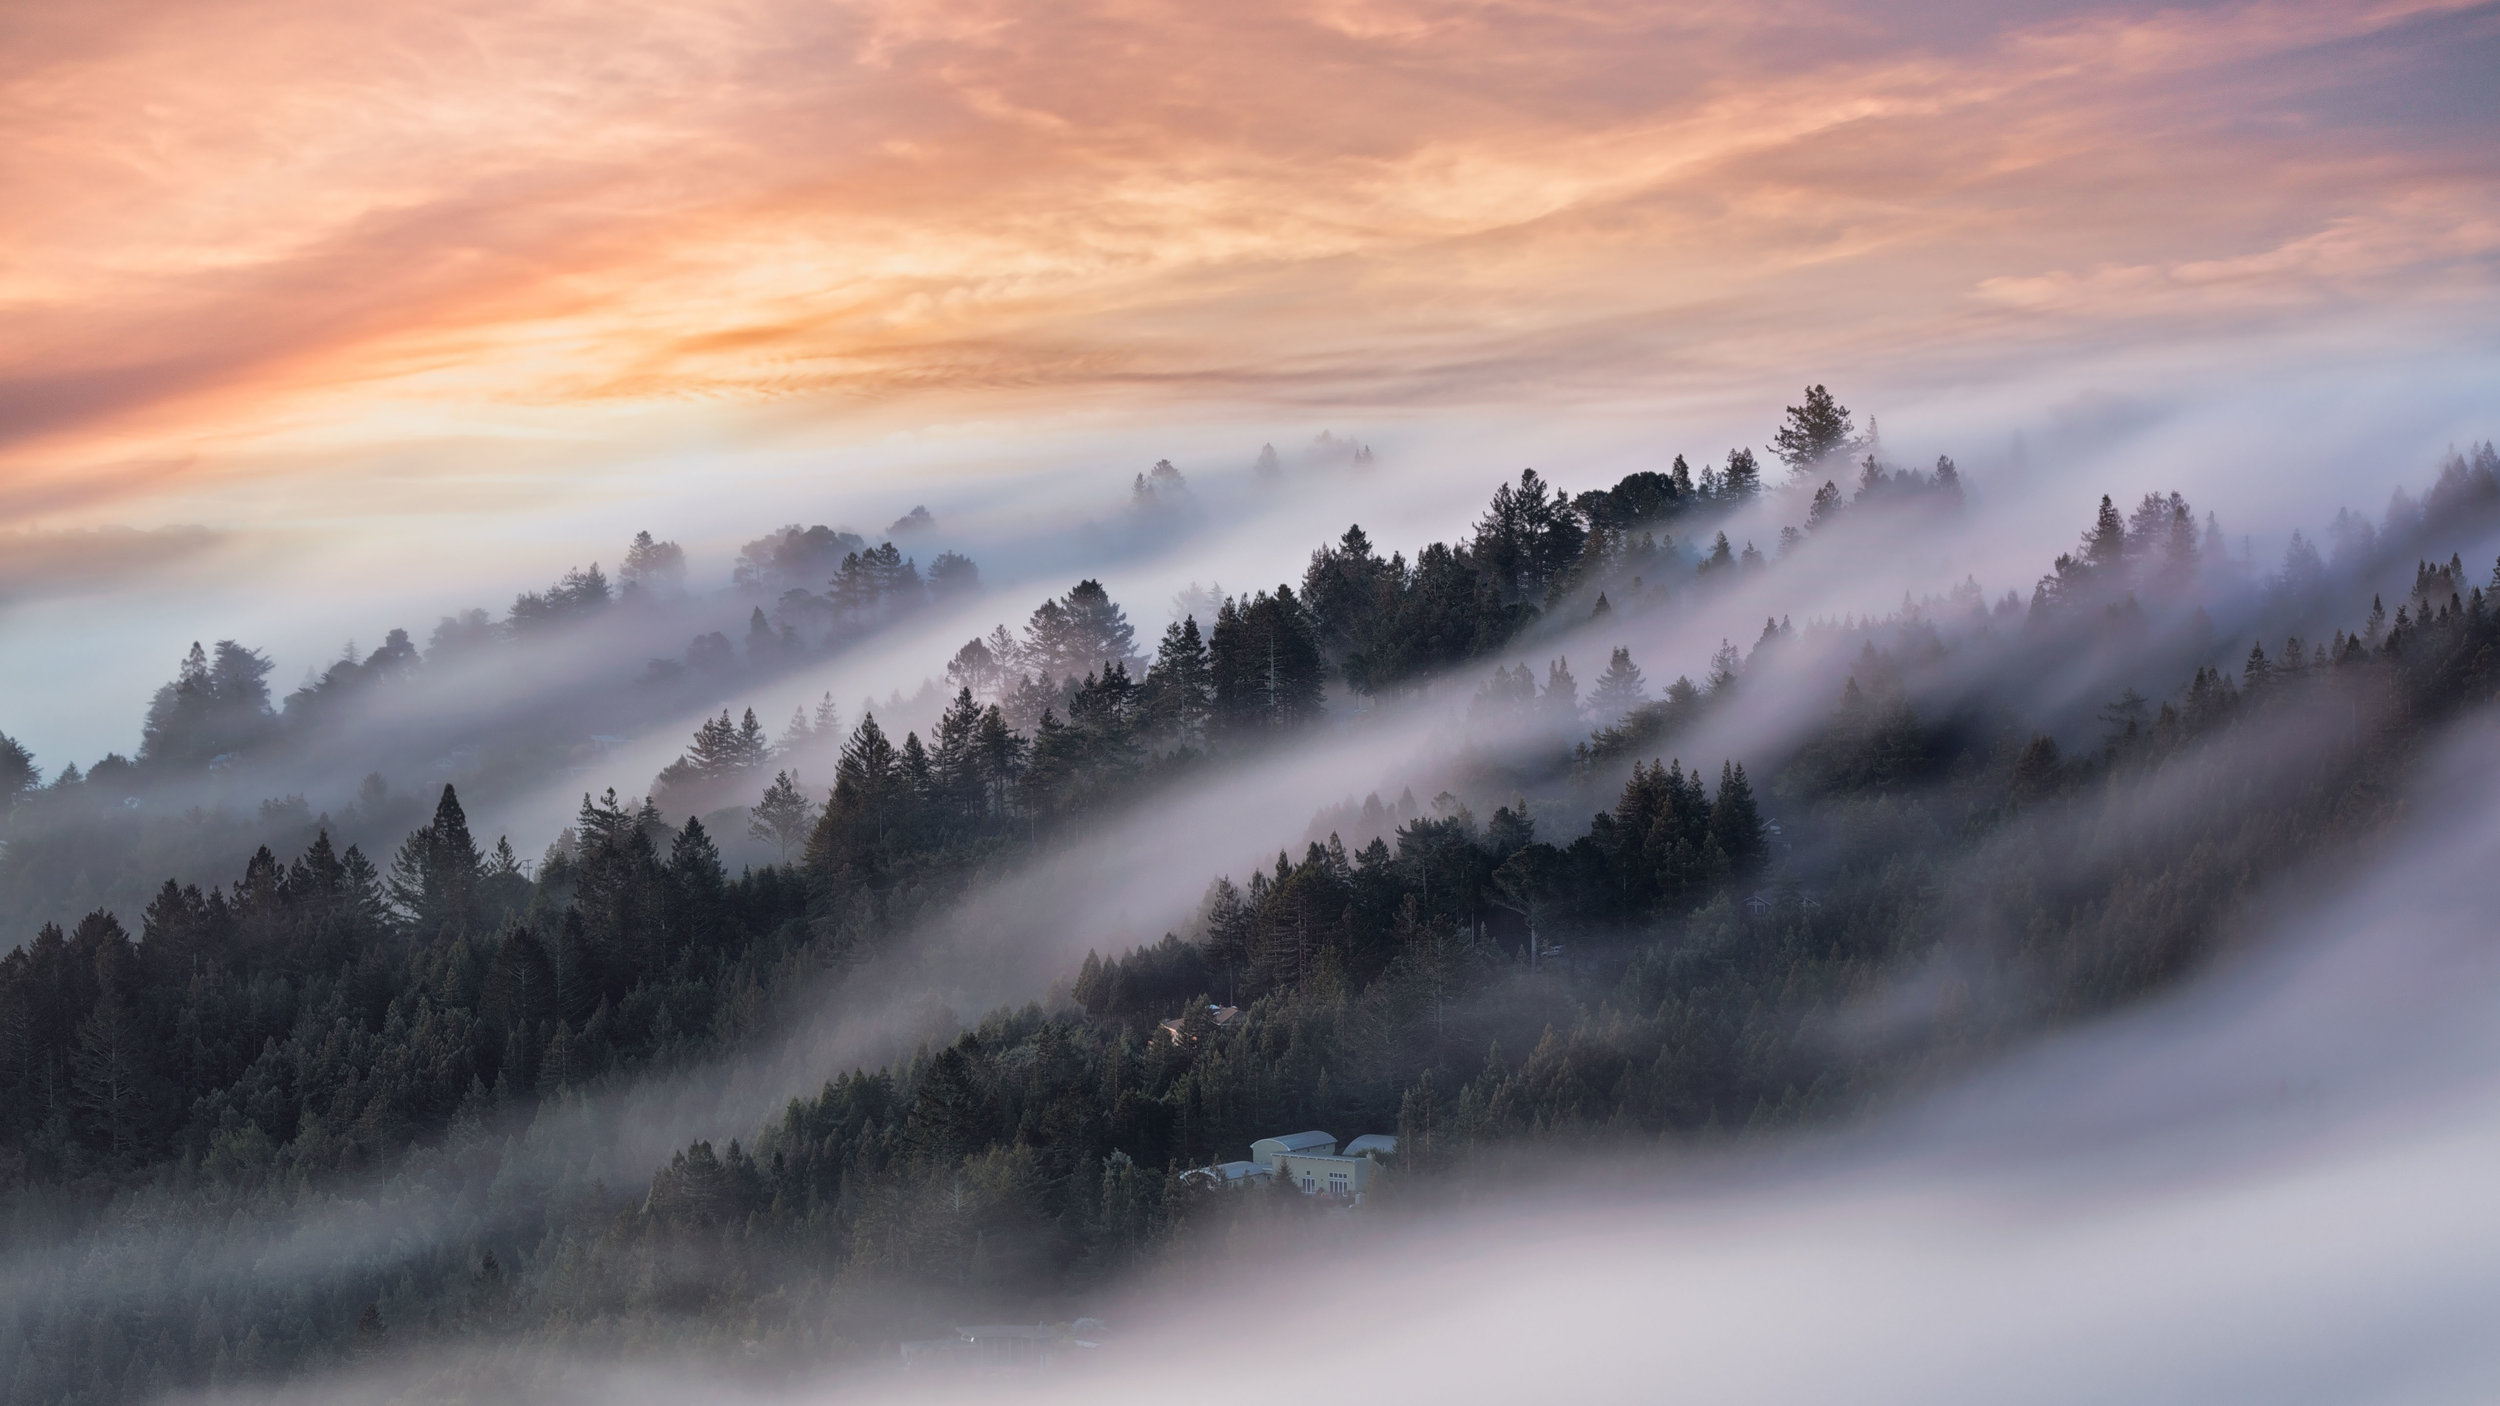 Living in a sea of fog